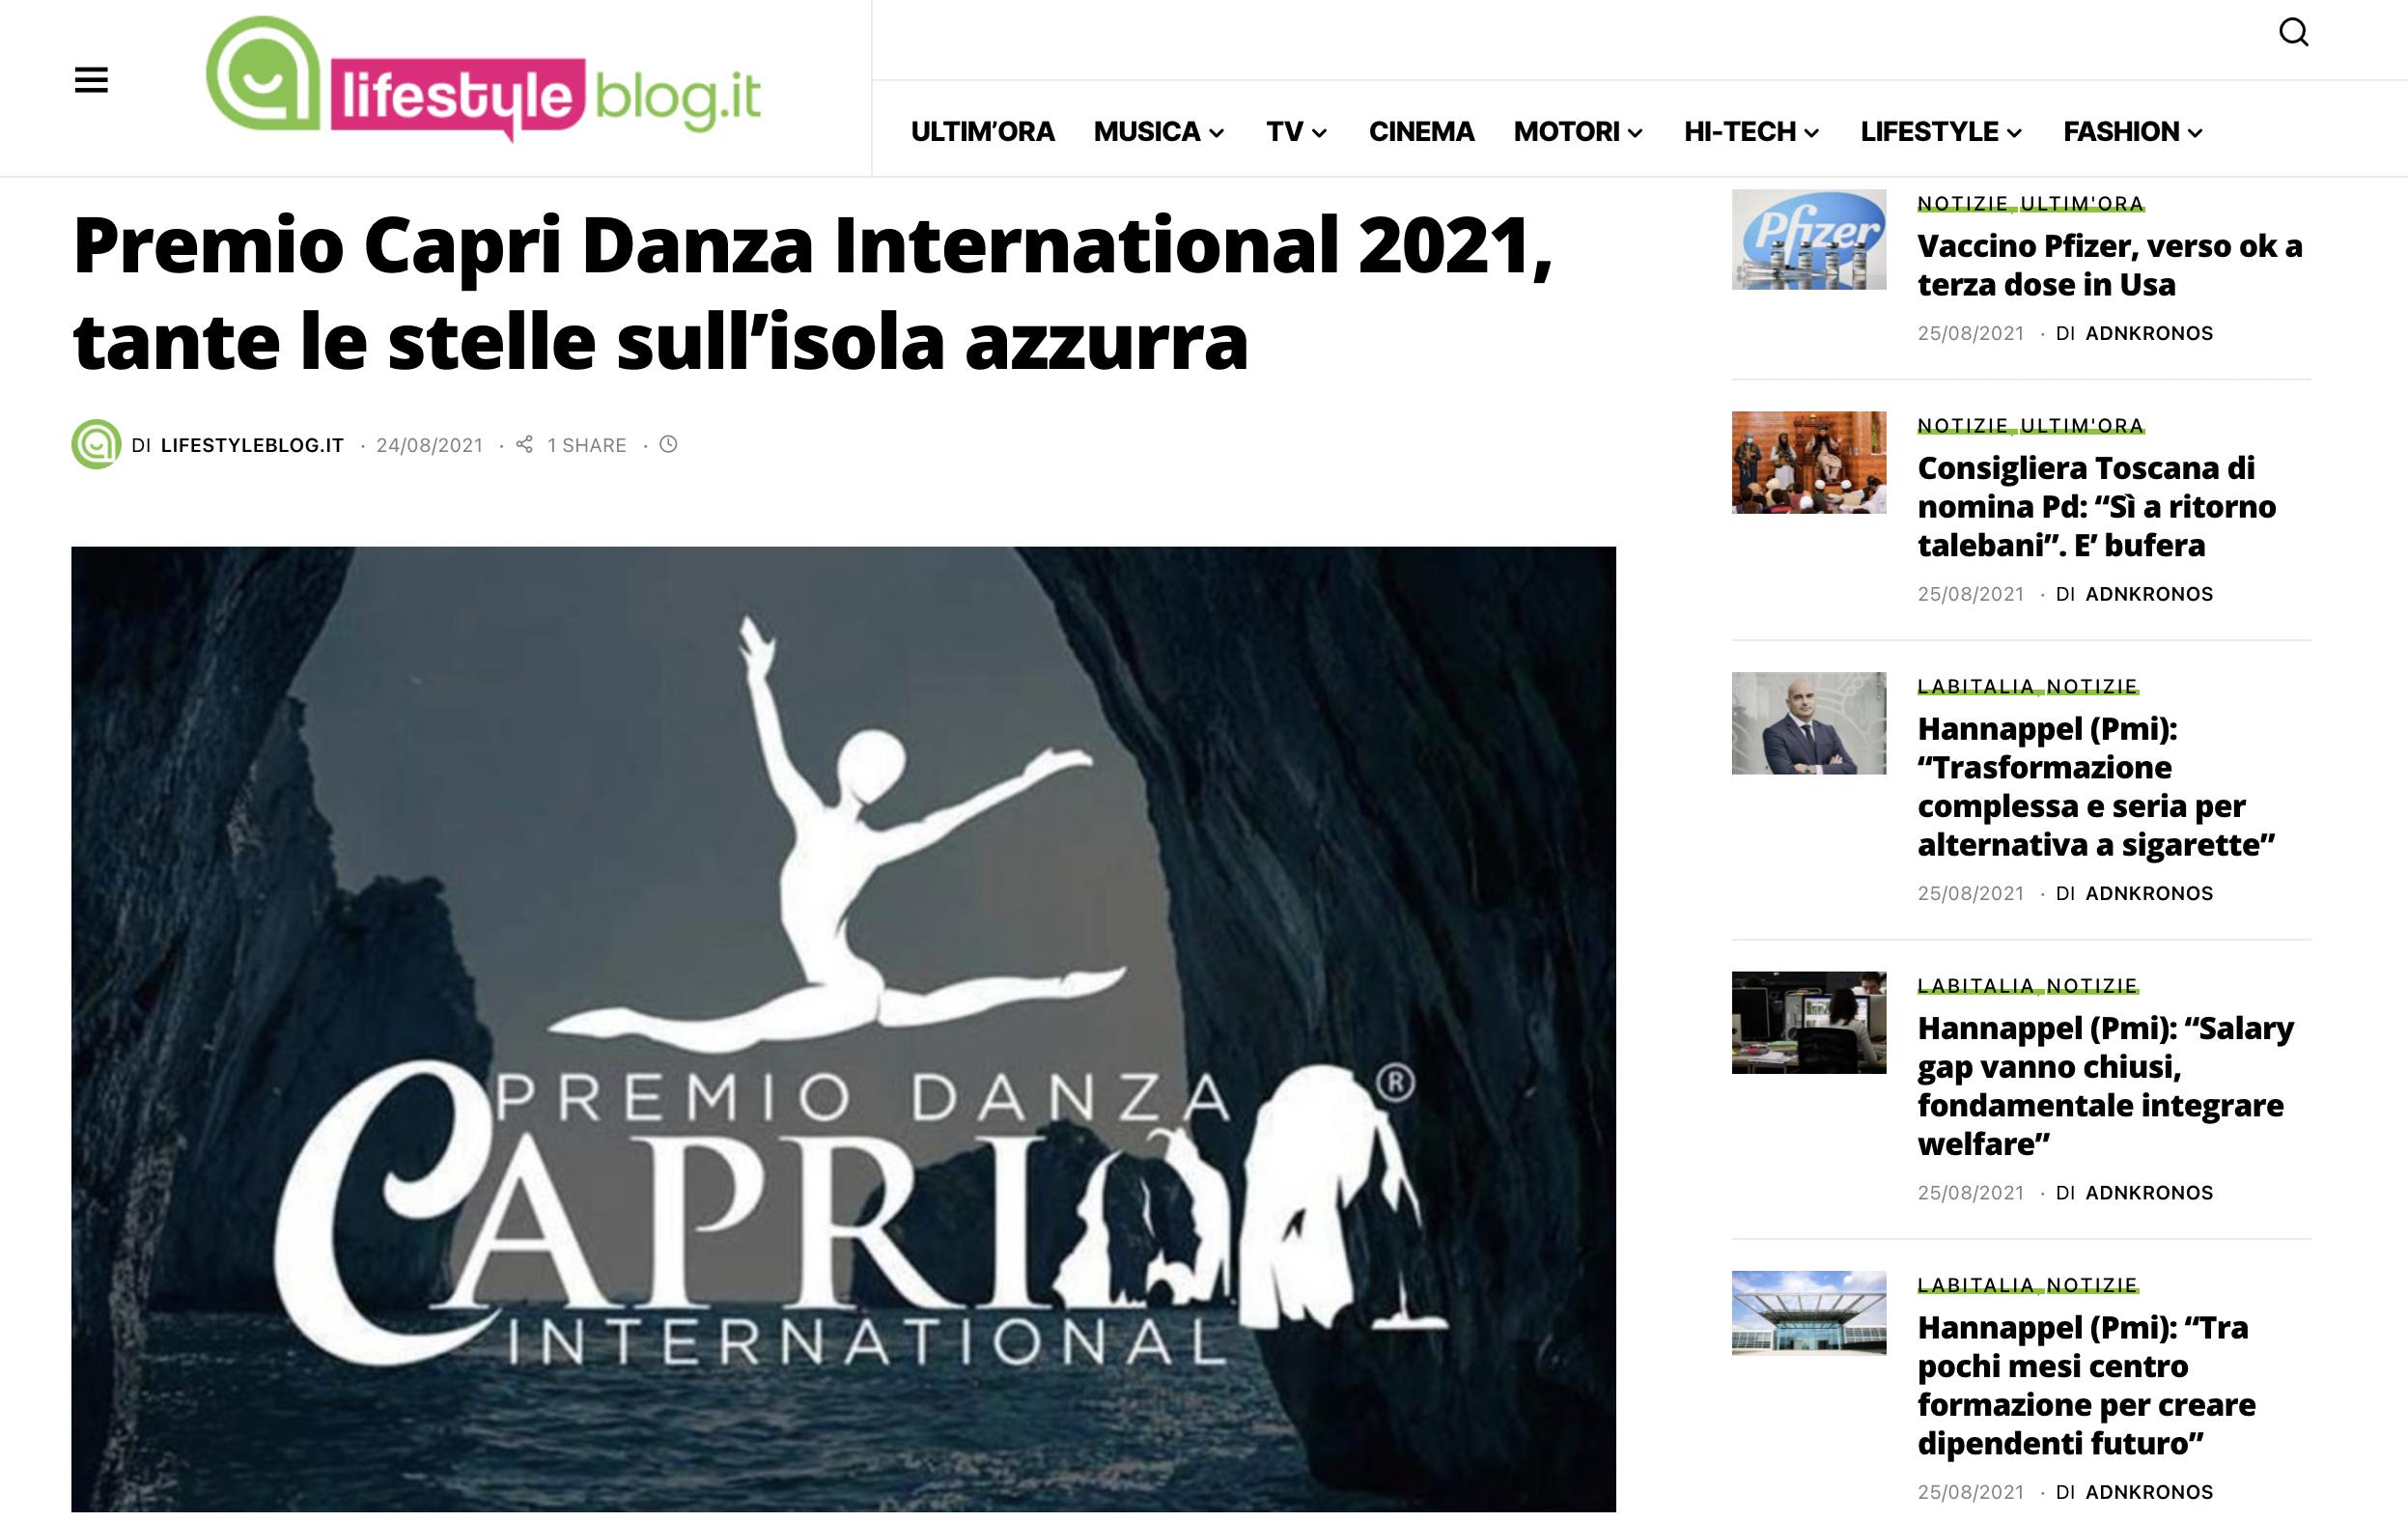 Premio Capri Danza International – LifestyleBlog